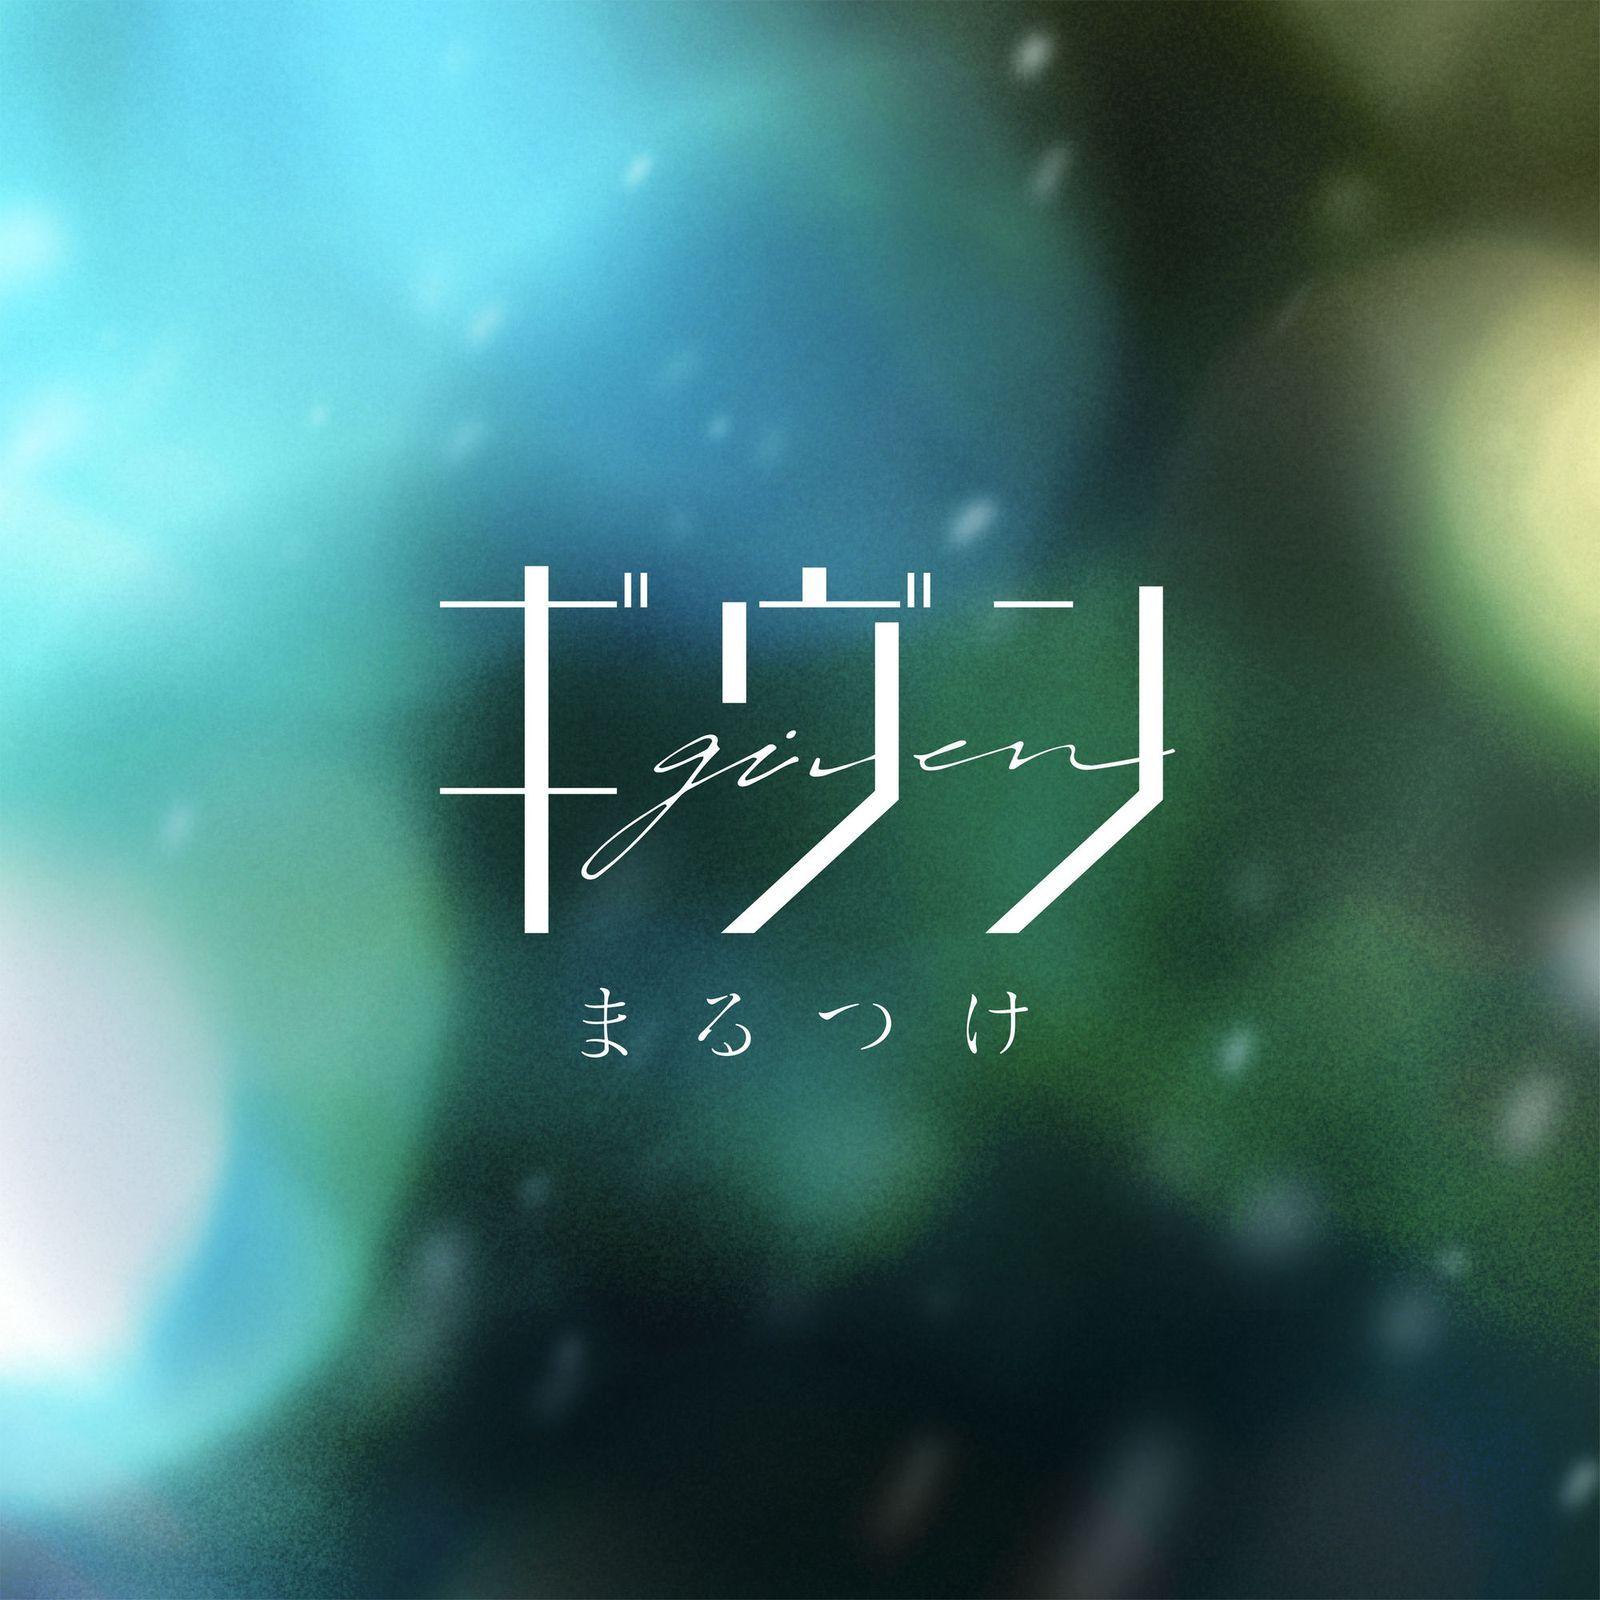 Marutsuke - まるつけ by Given - ギヴン Ending Full (Mafuyu Sato